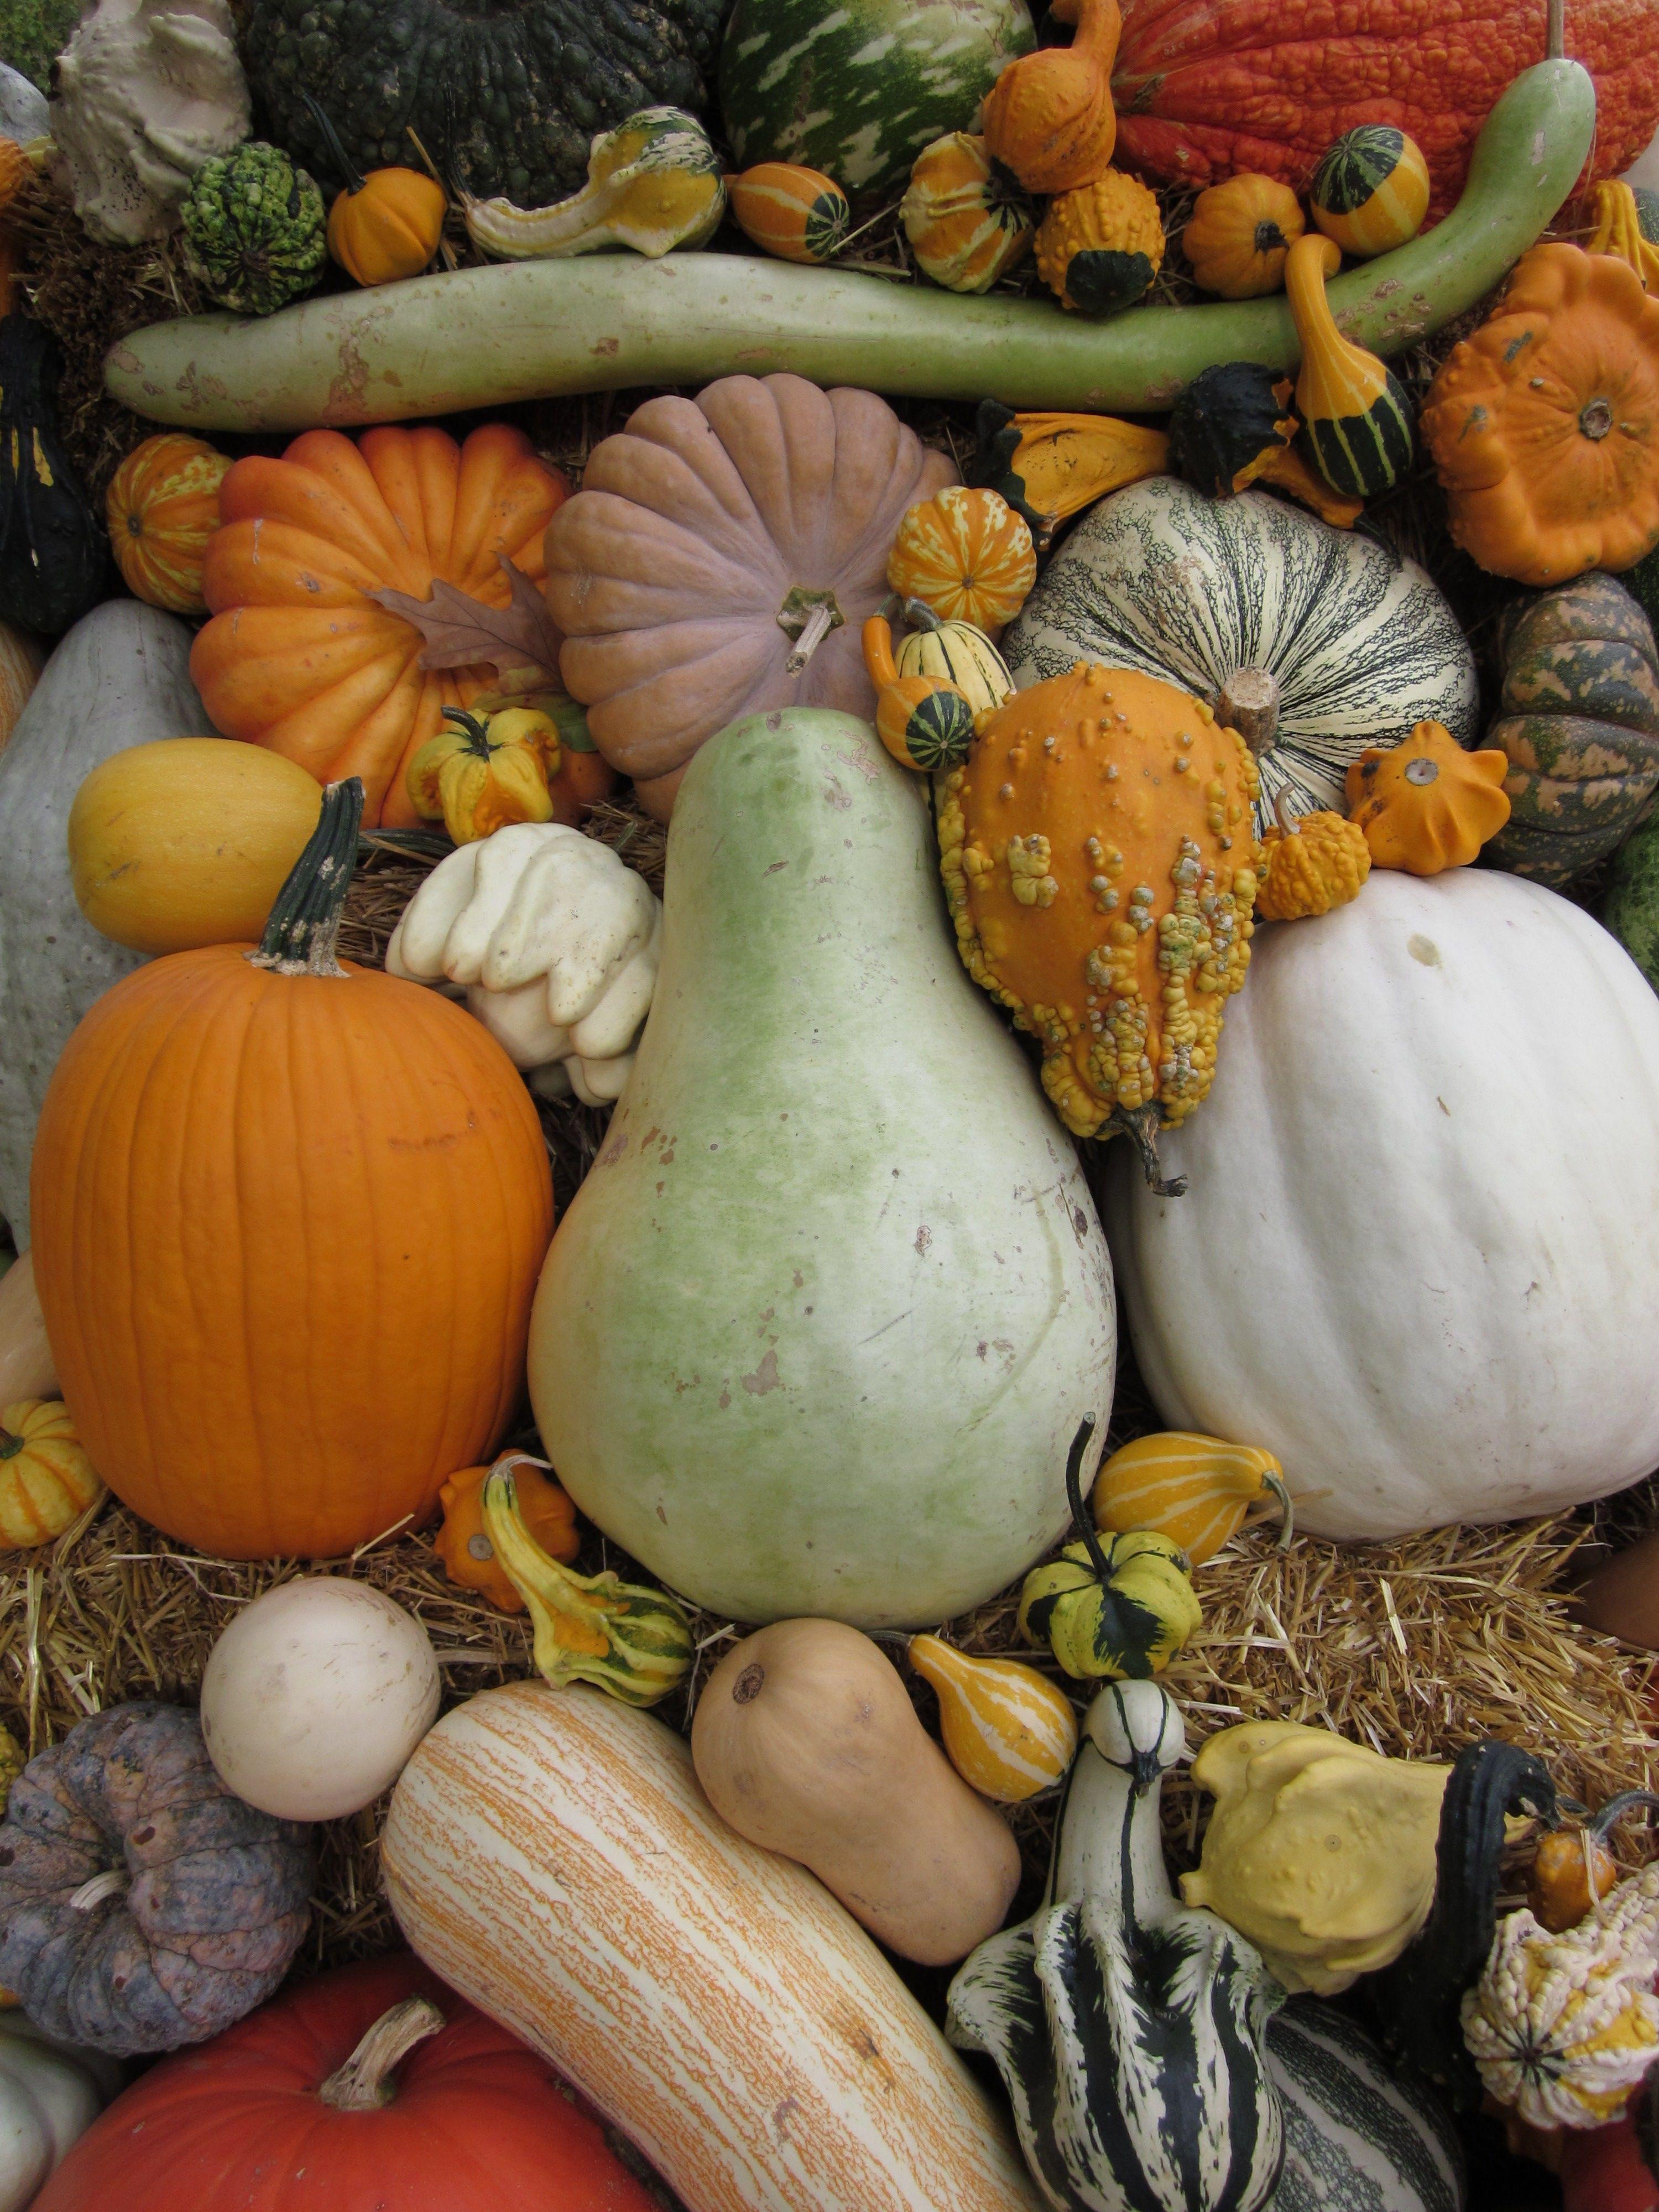 Pumpkins Gourds Squash Love Them All Www